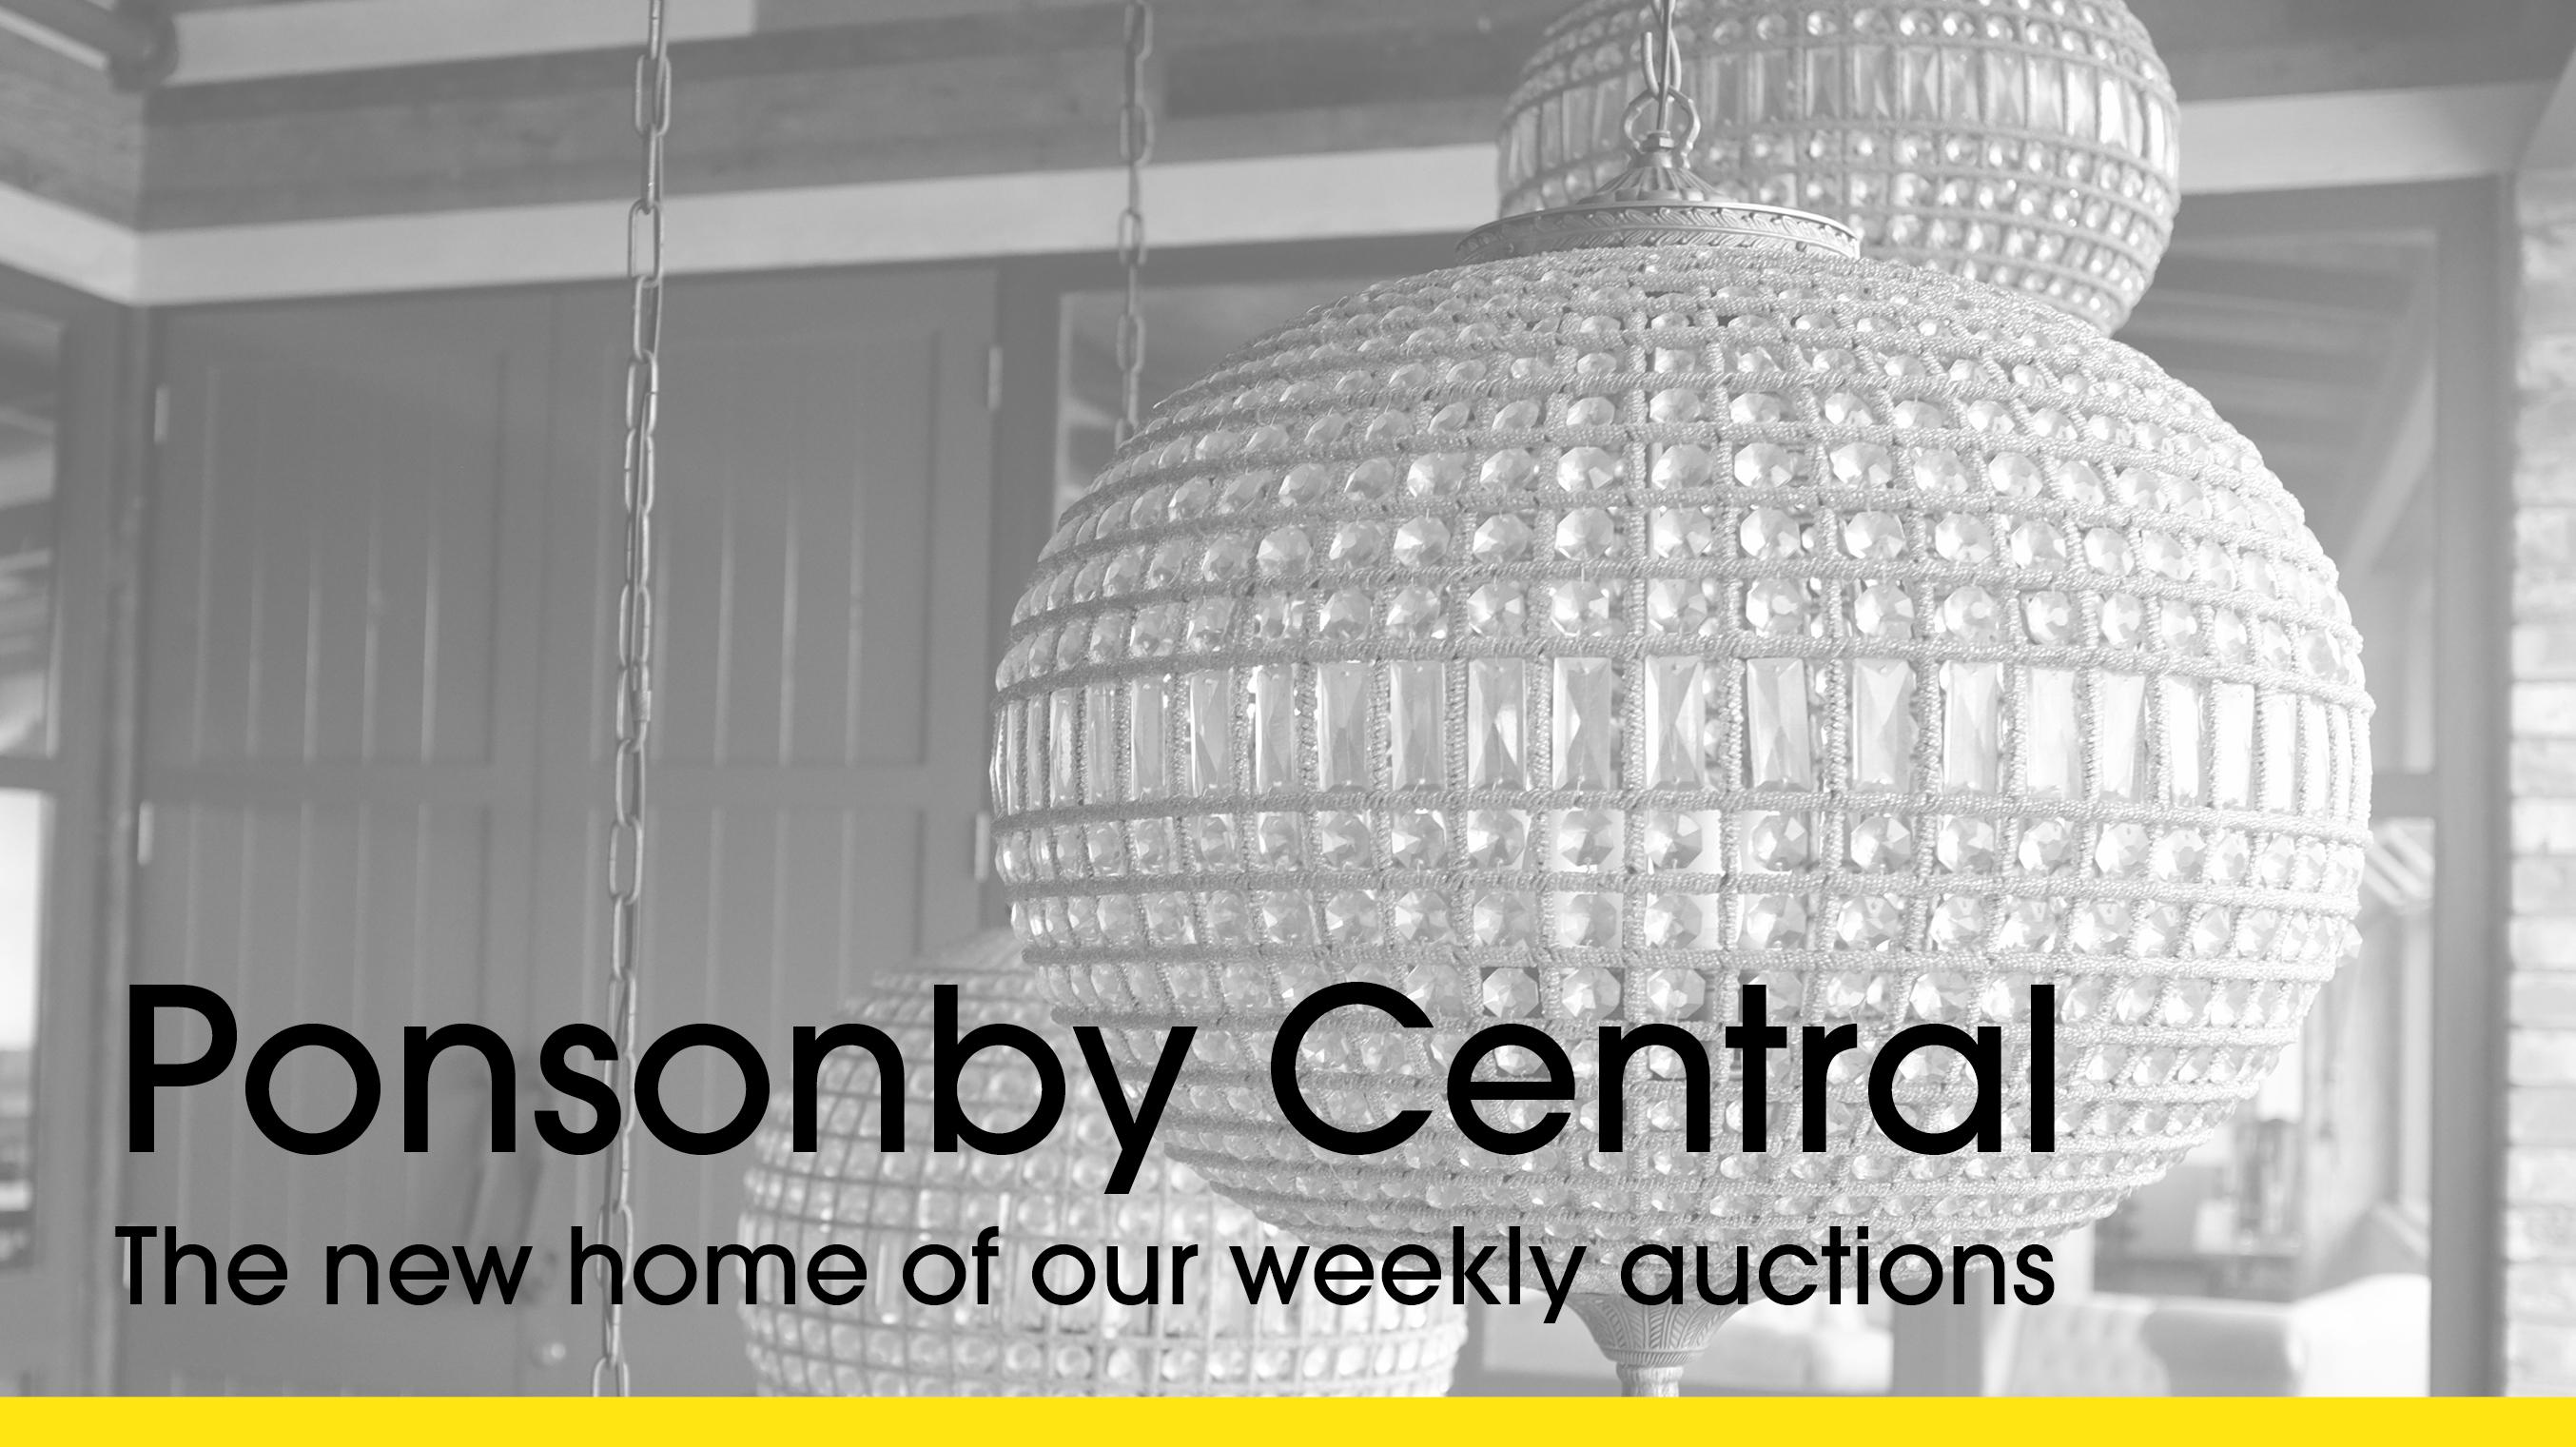 Ponsonby Central